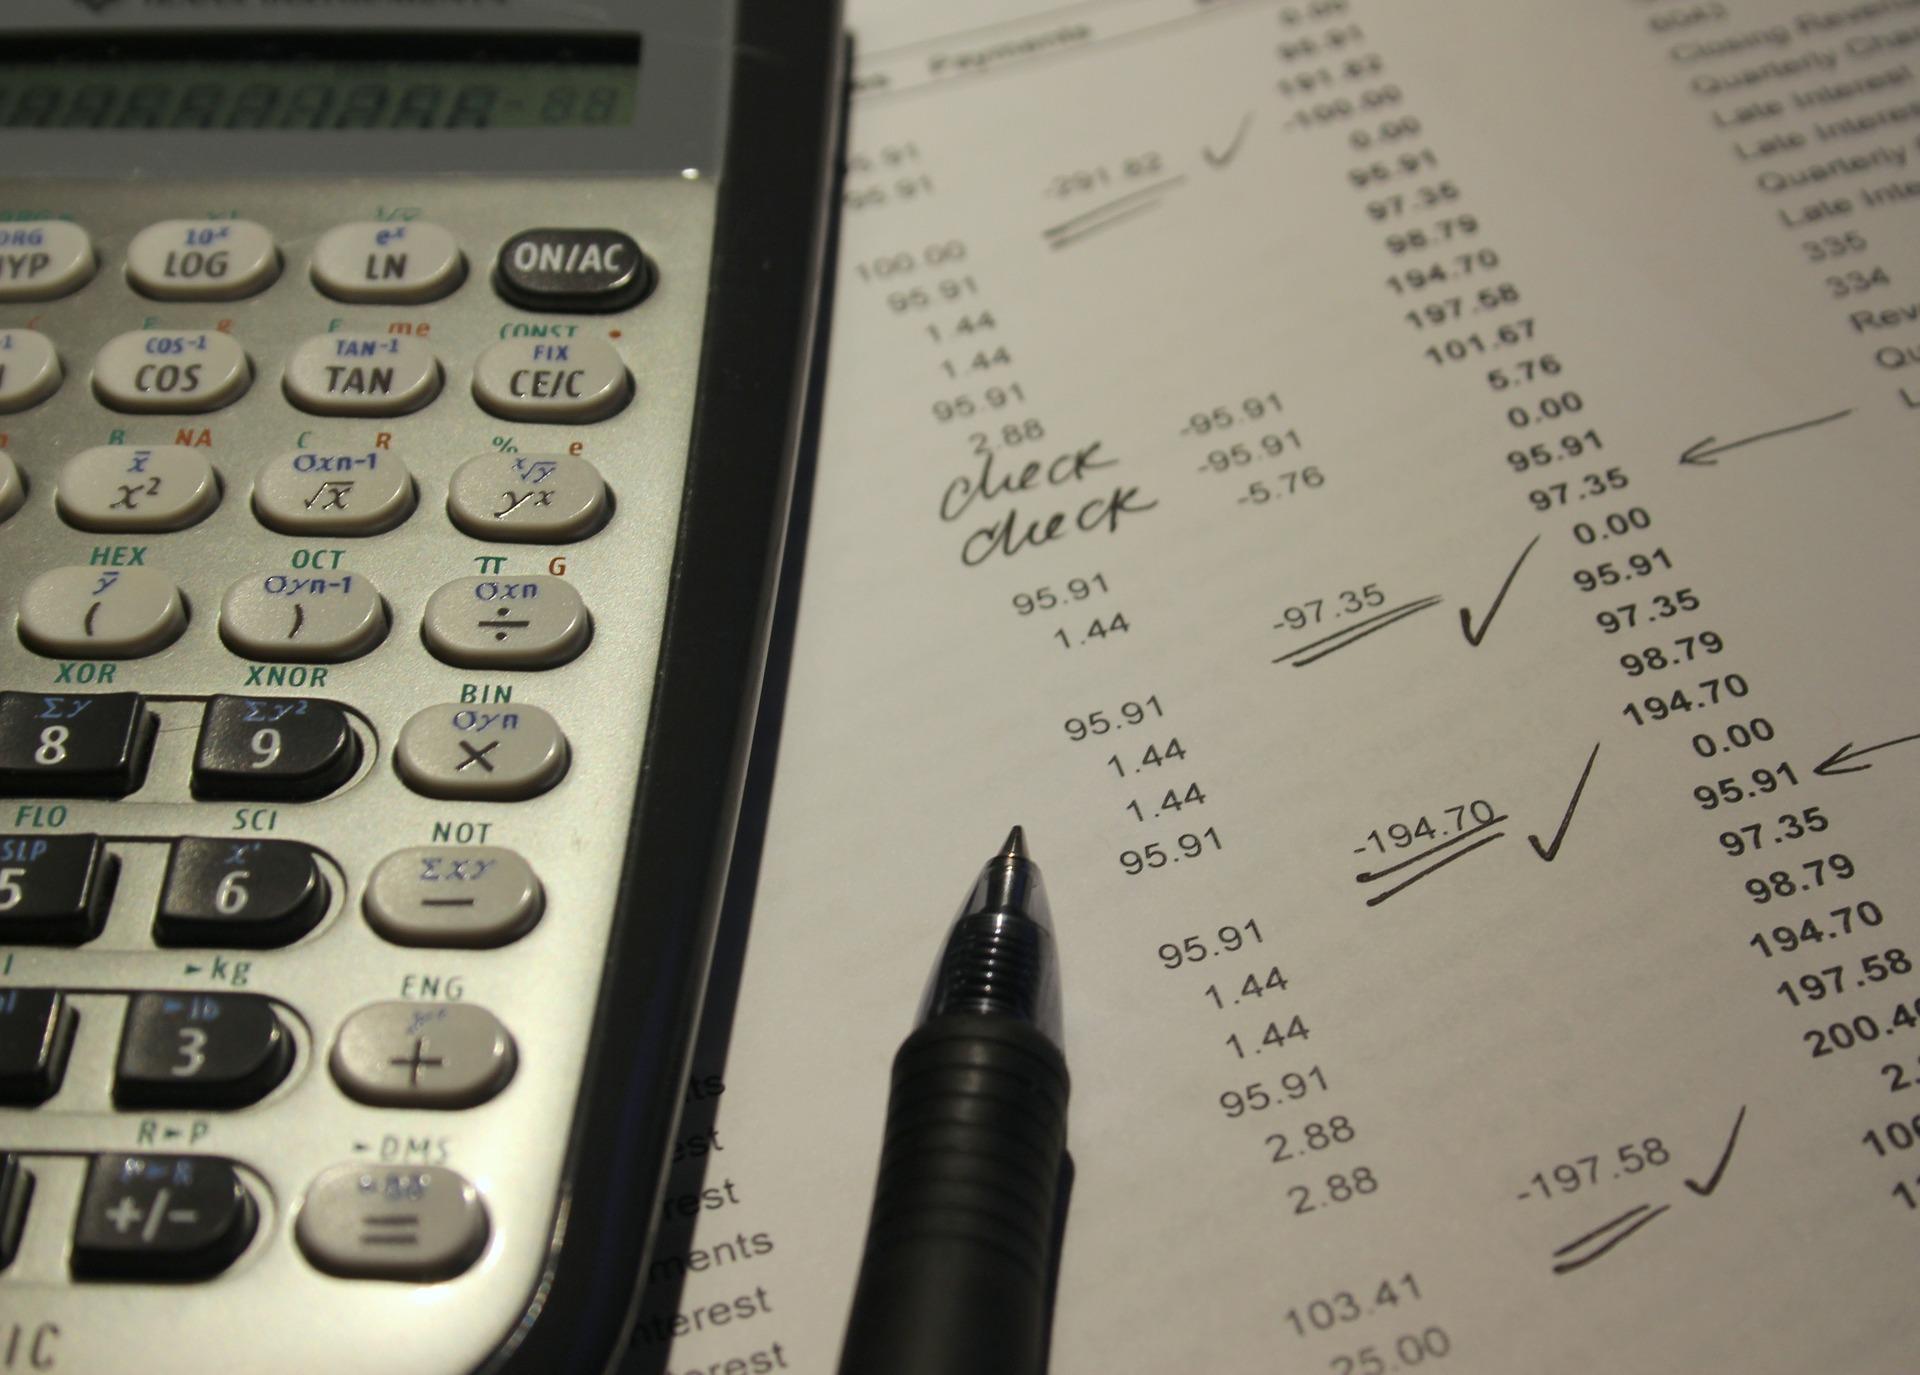 Limited Company Tax Calculator for Corporation Tax - Company Bug